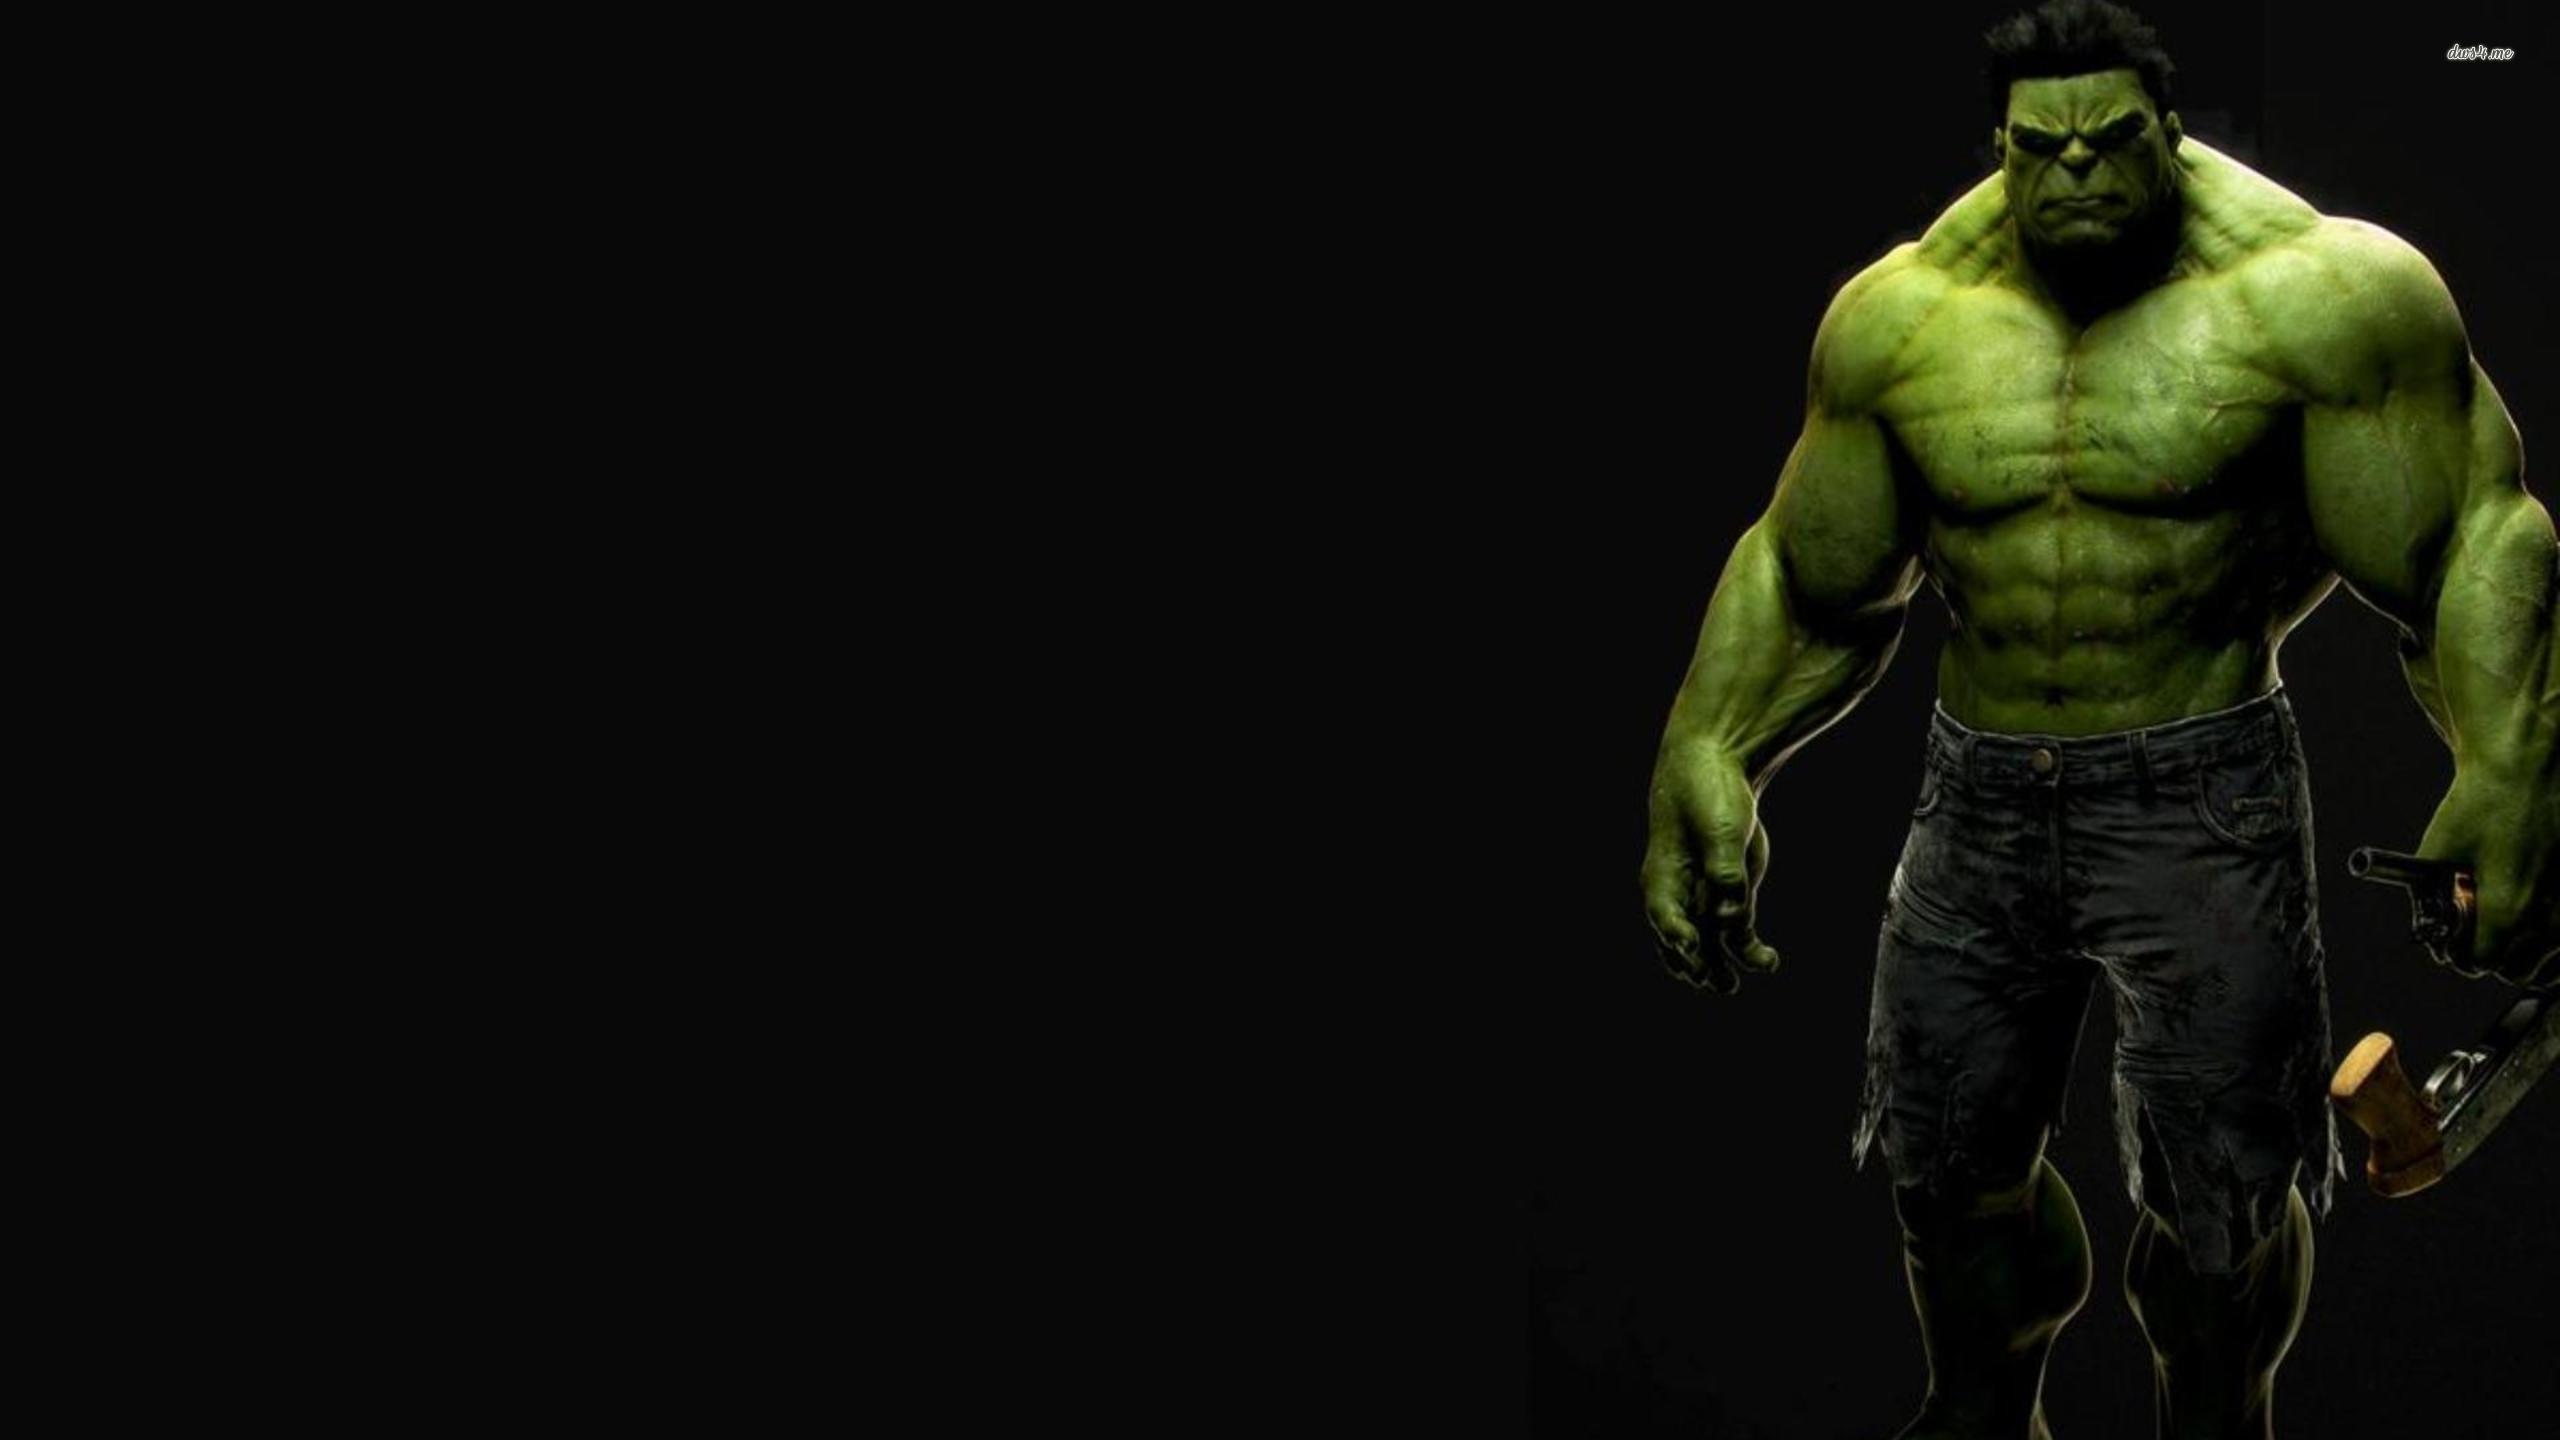 The Hulk wallpaper   Movie wallpapers   15074 2560x1440